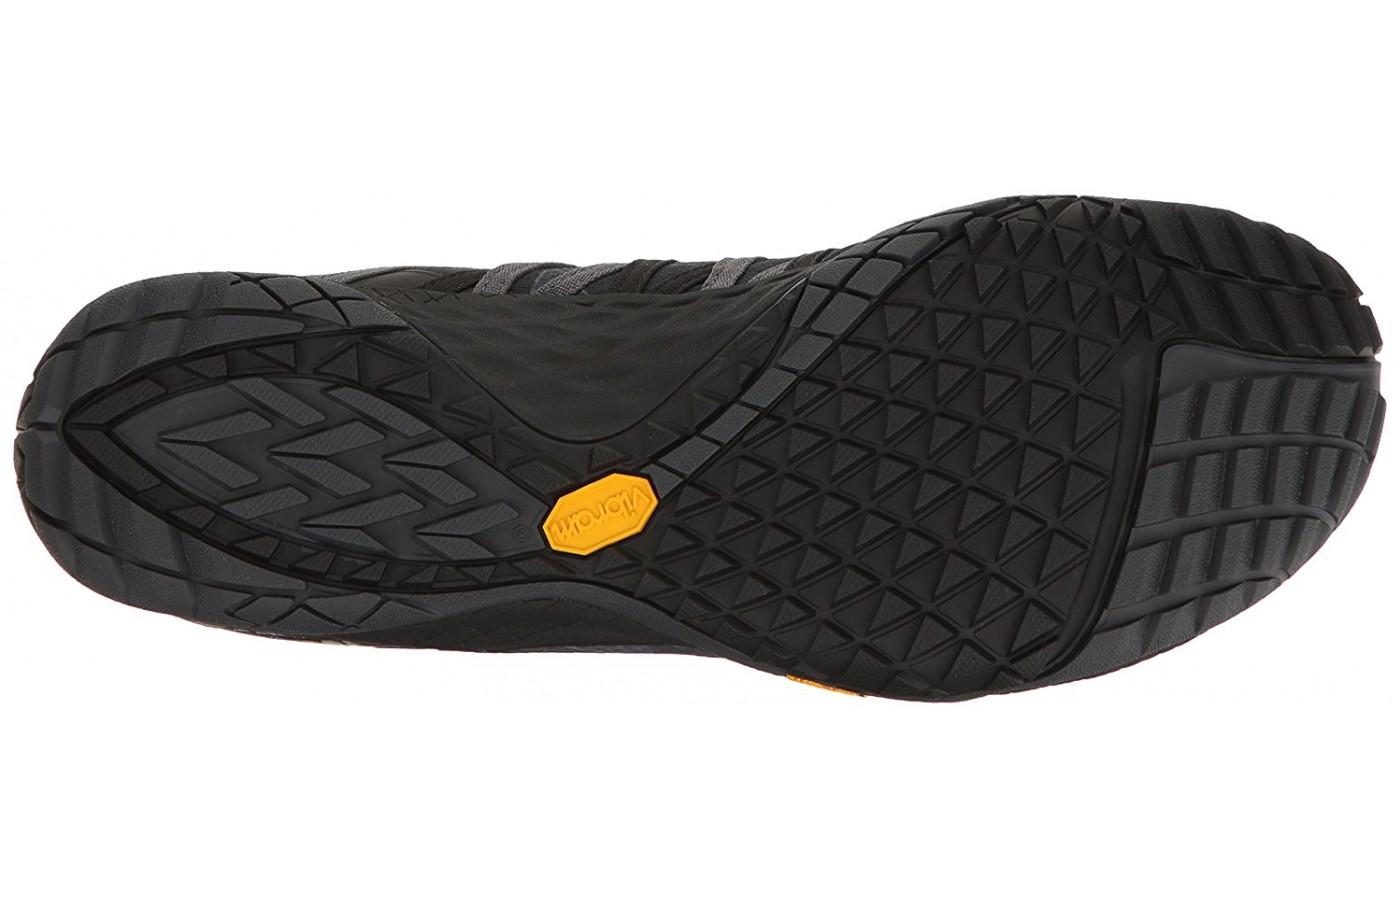 Merrell Trail Glove 4 sole